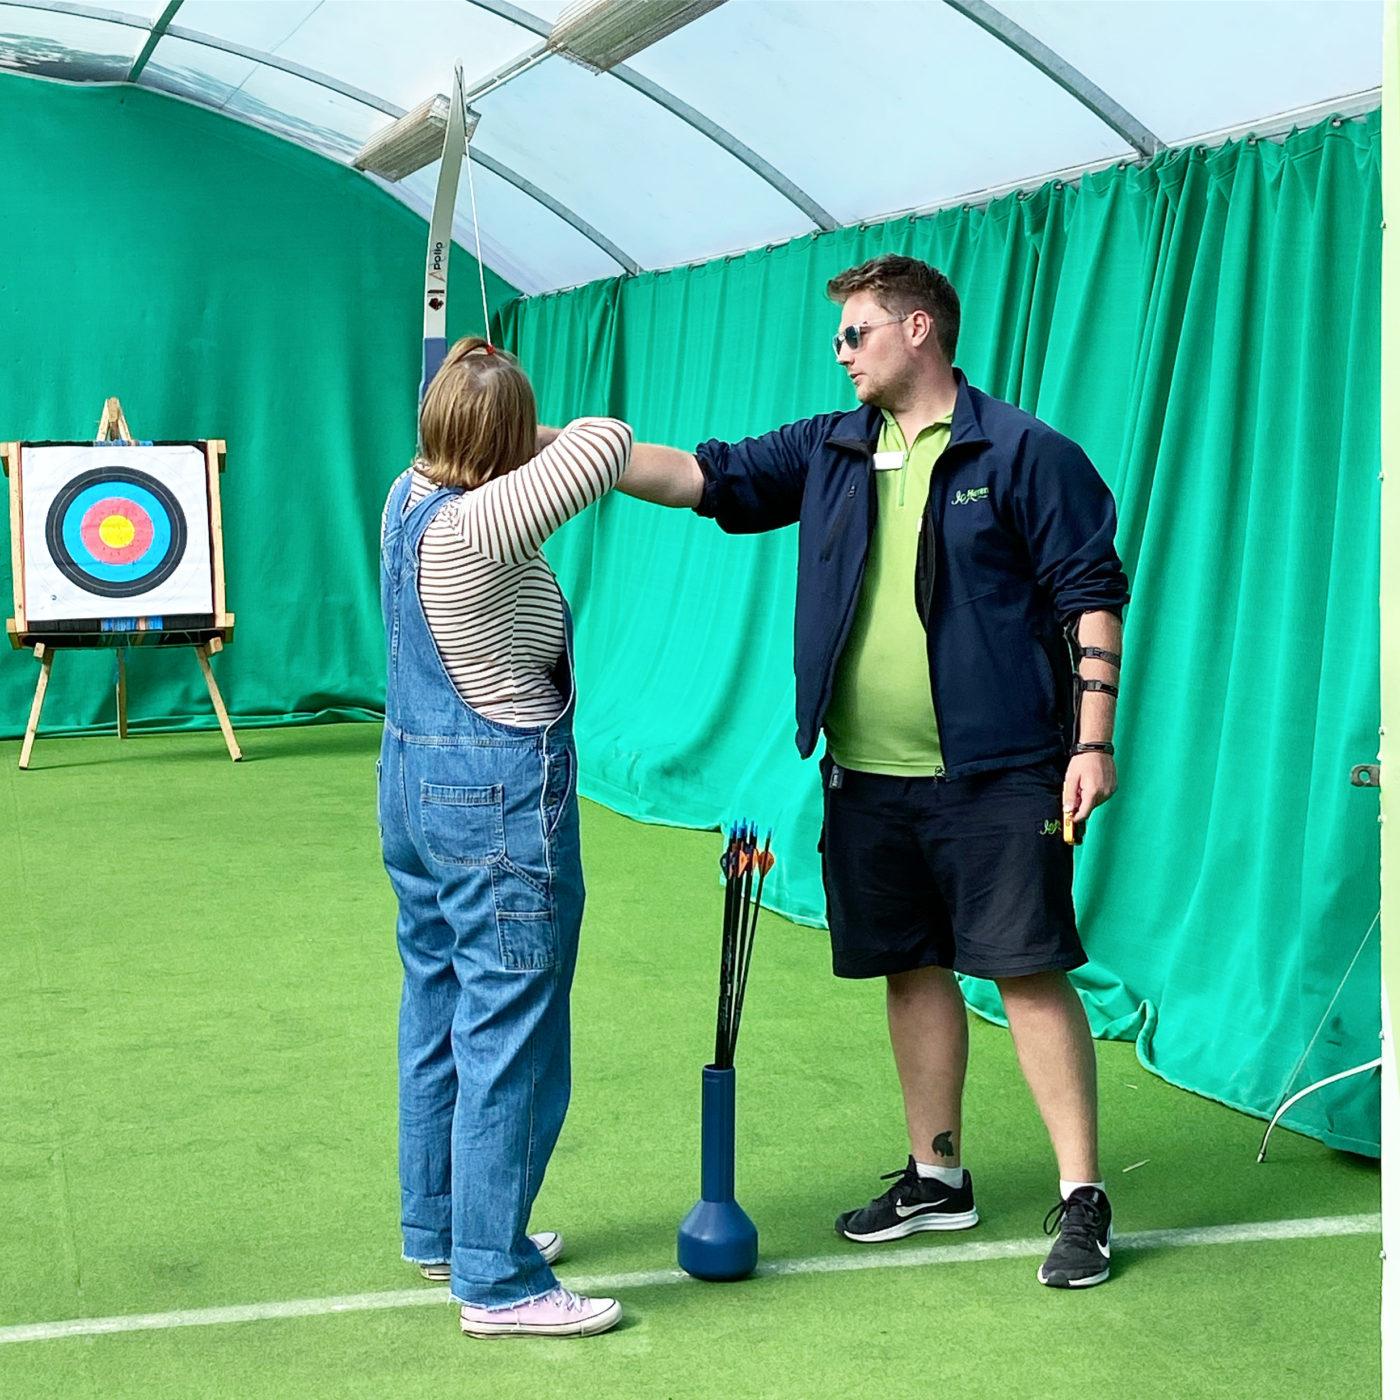 Haven Littlesea archery